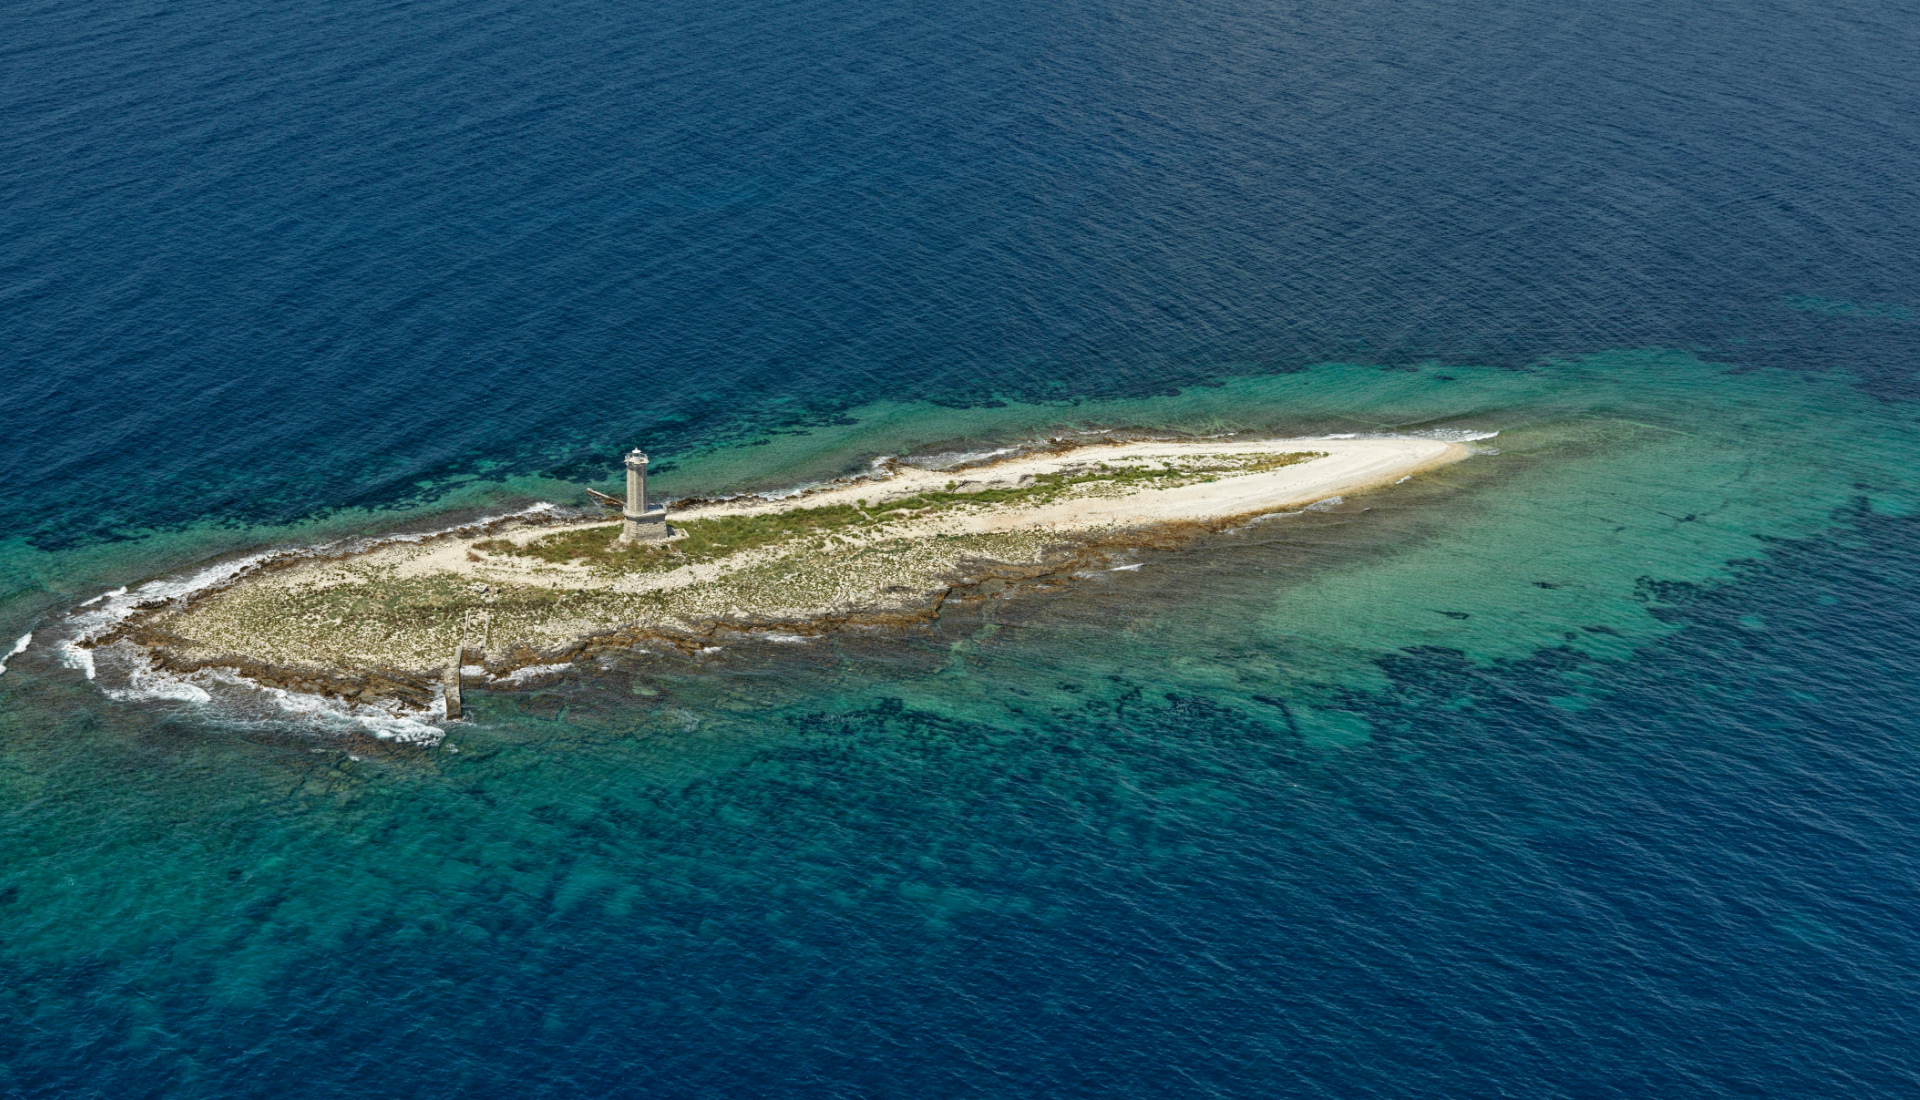 Chorvatsko-ostrov s majákem - Letova fotografie - Miroslav Kamrla - 2- 1920x1110_4.jpg